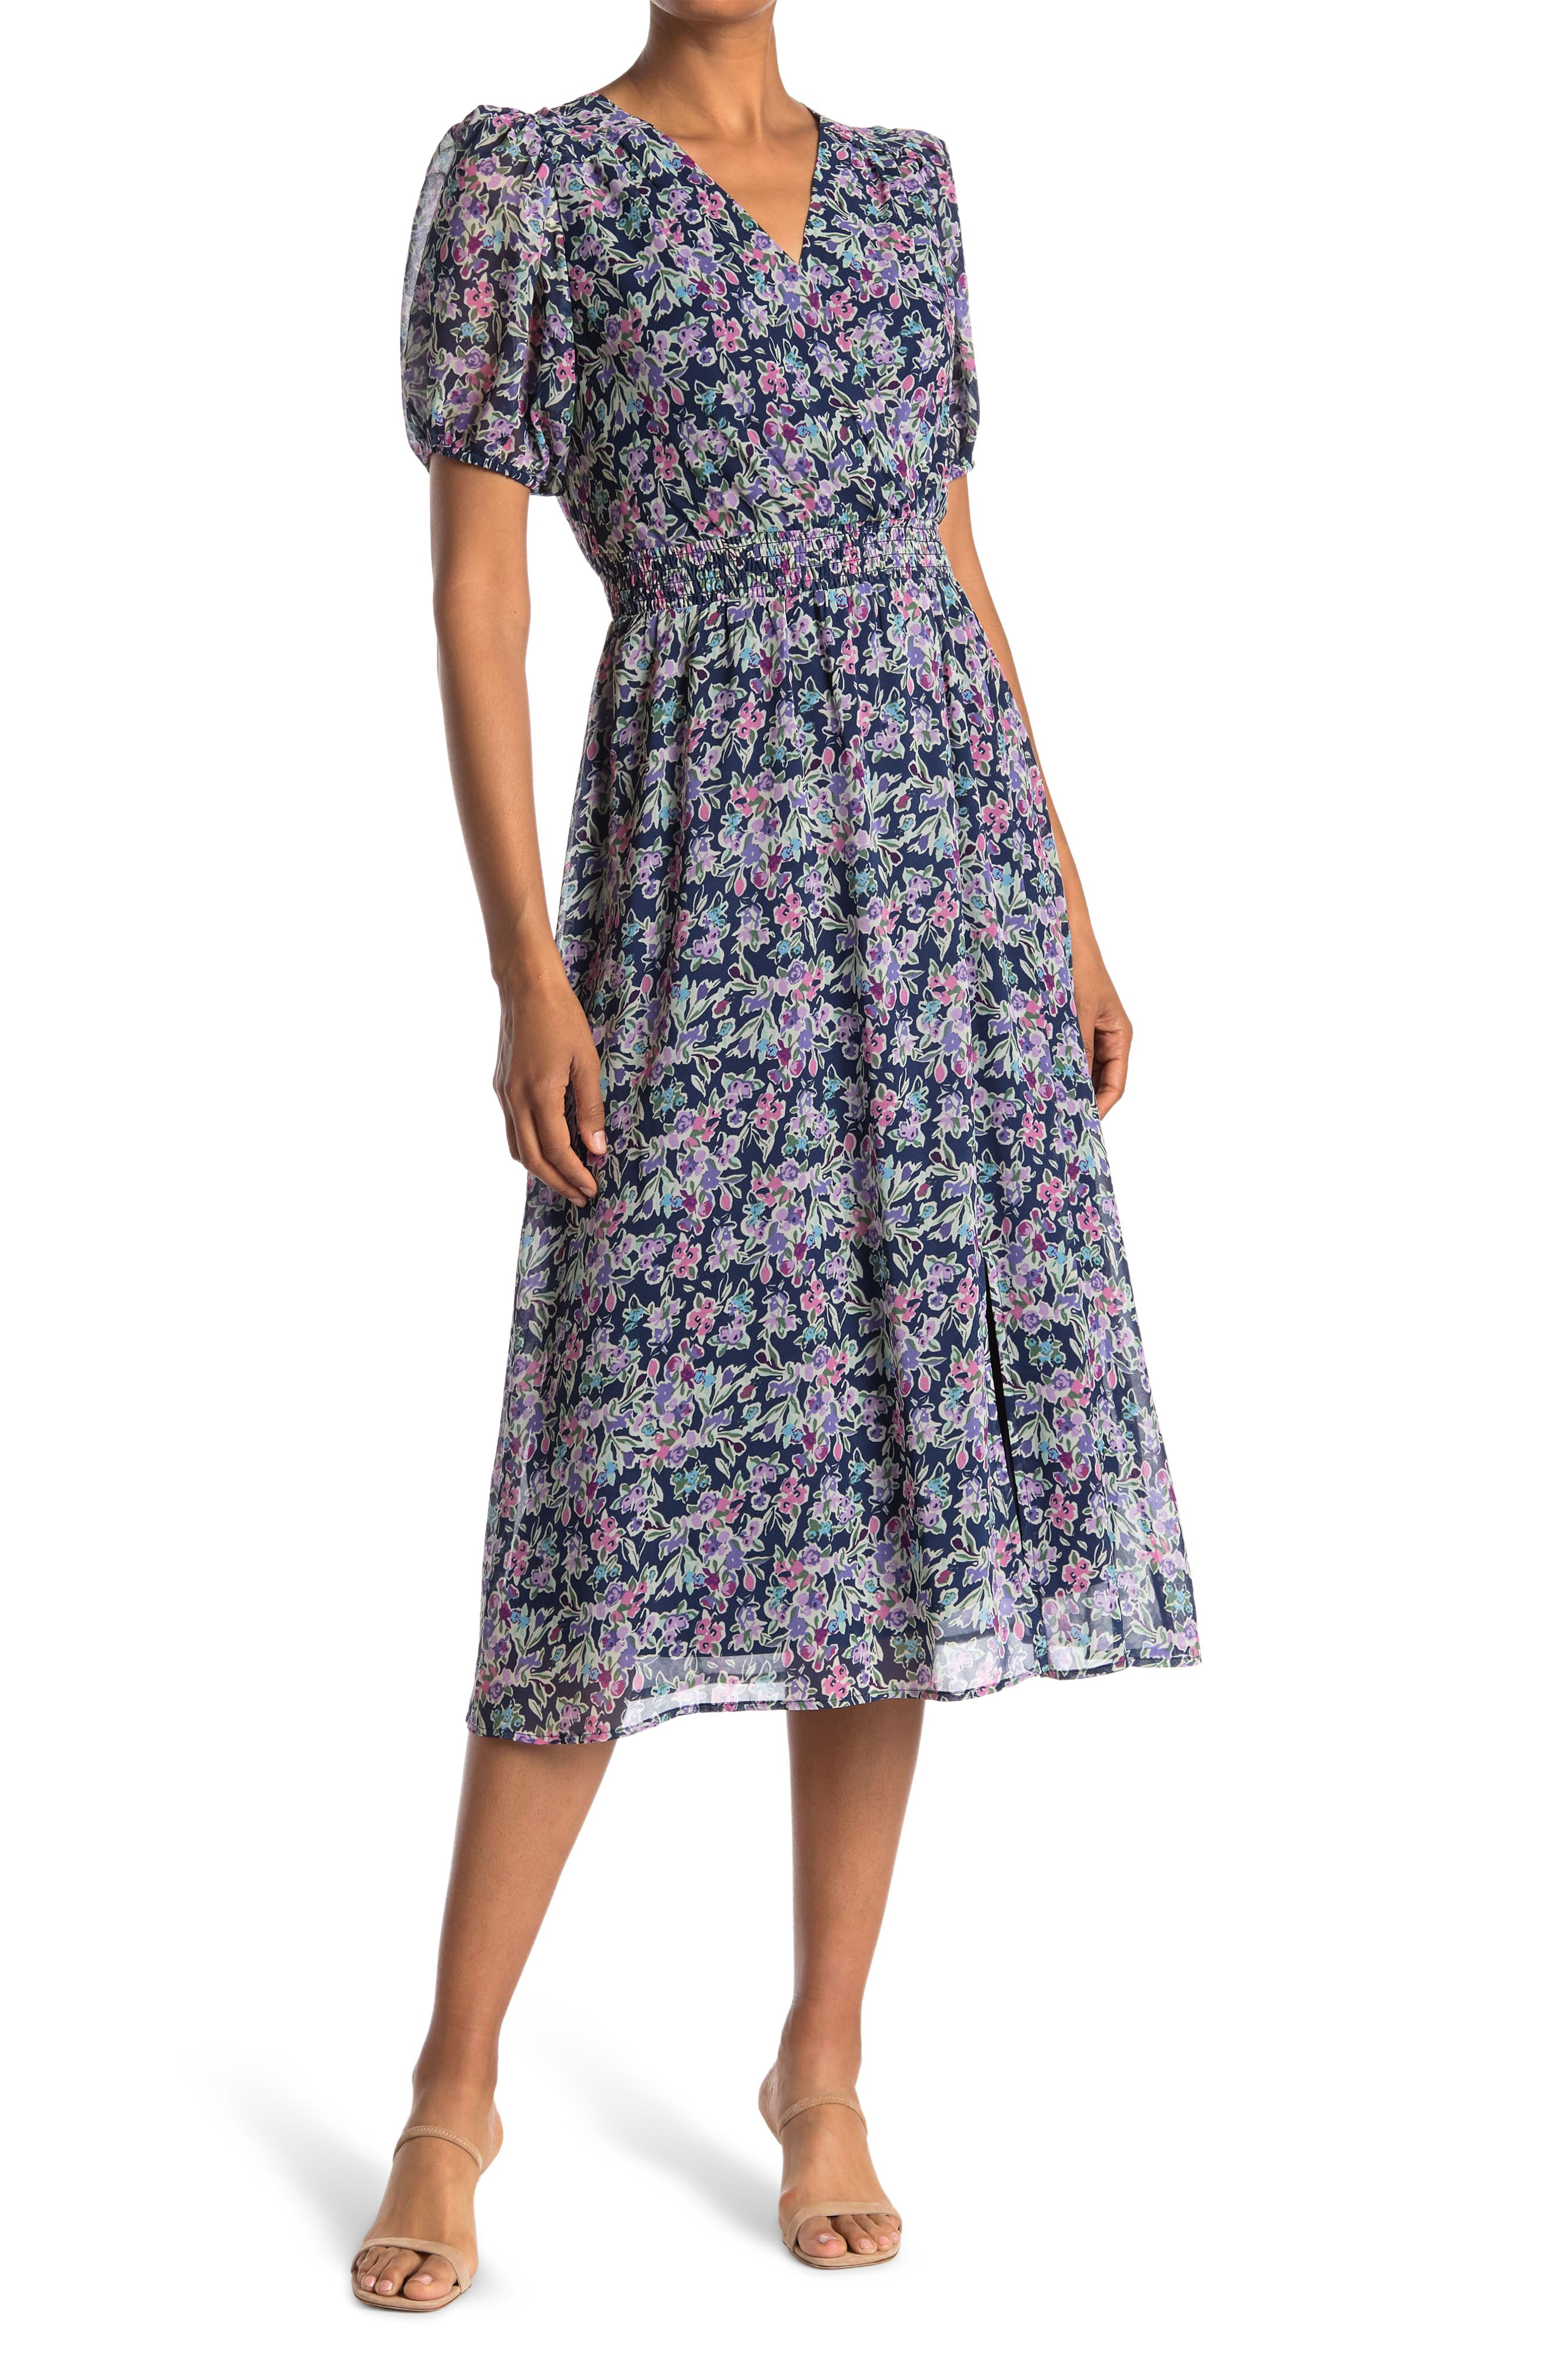 Vintage Style Dresses | Vintage Inspired Dresses COLLECTIVE CONCEPTS Floral Puff Sleeve Smocked Waist Midi Dress Size X-Large in Floral Multi at Nordstrom Rack $44.97 AT vintagedancer.com